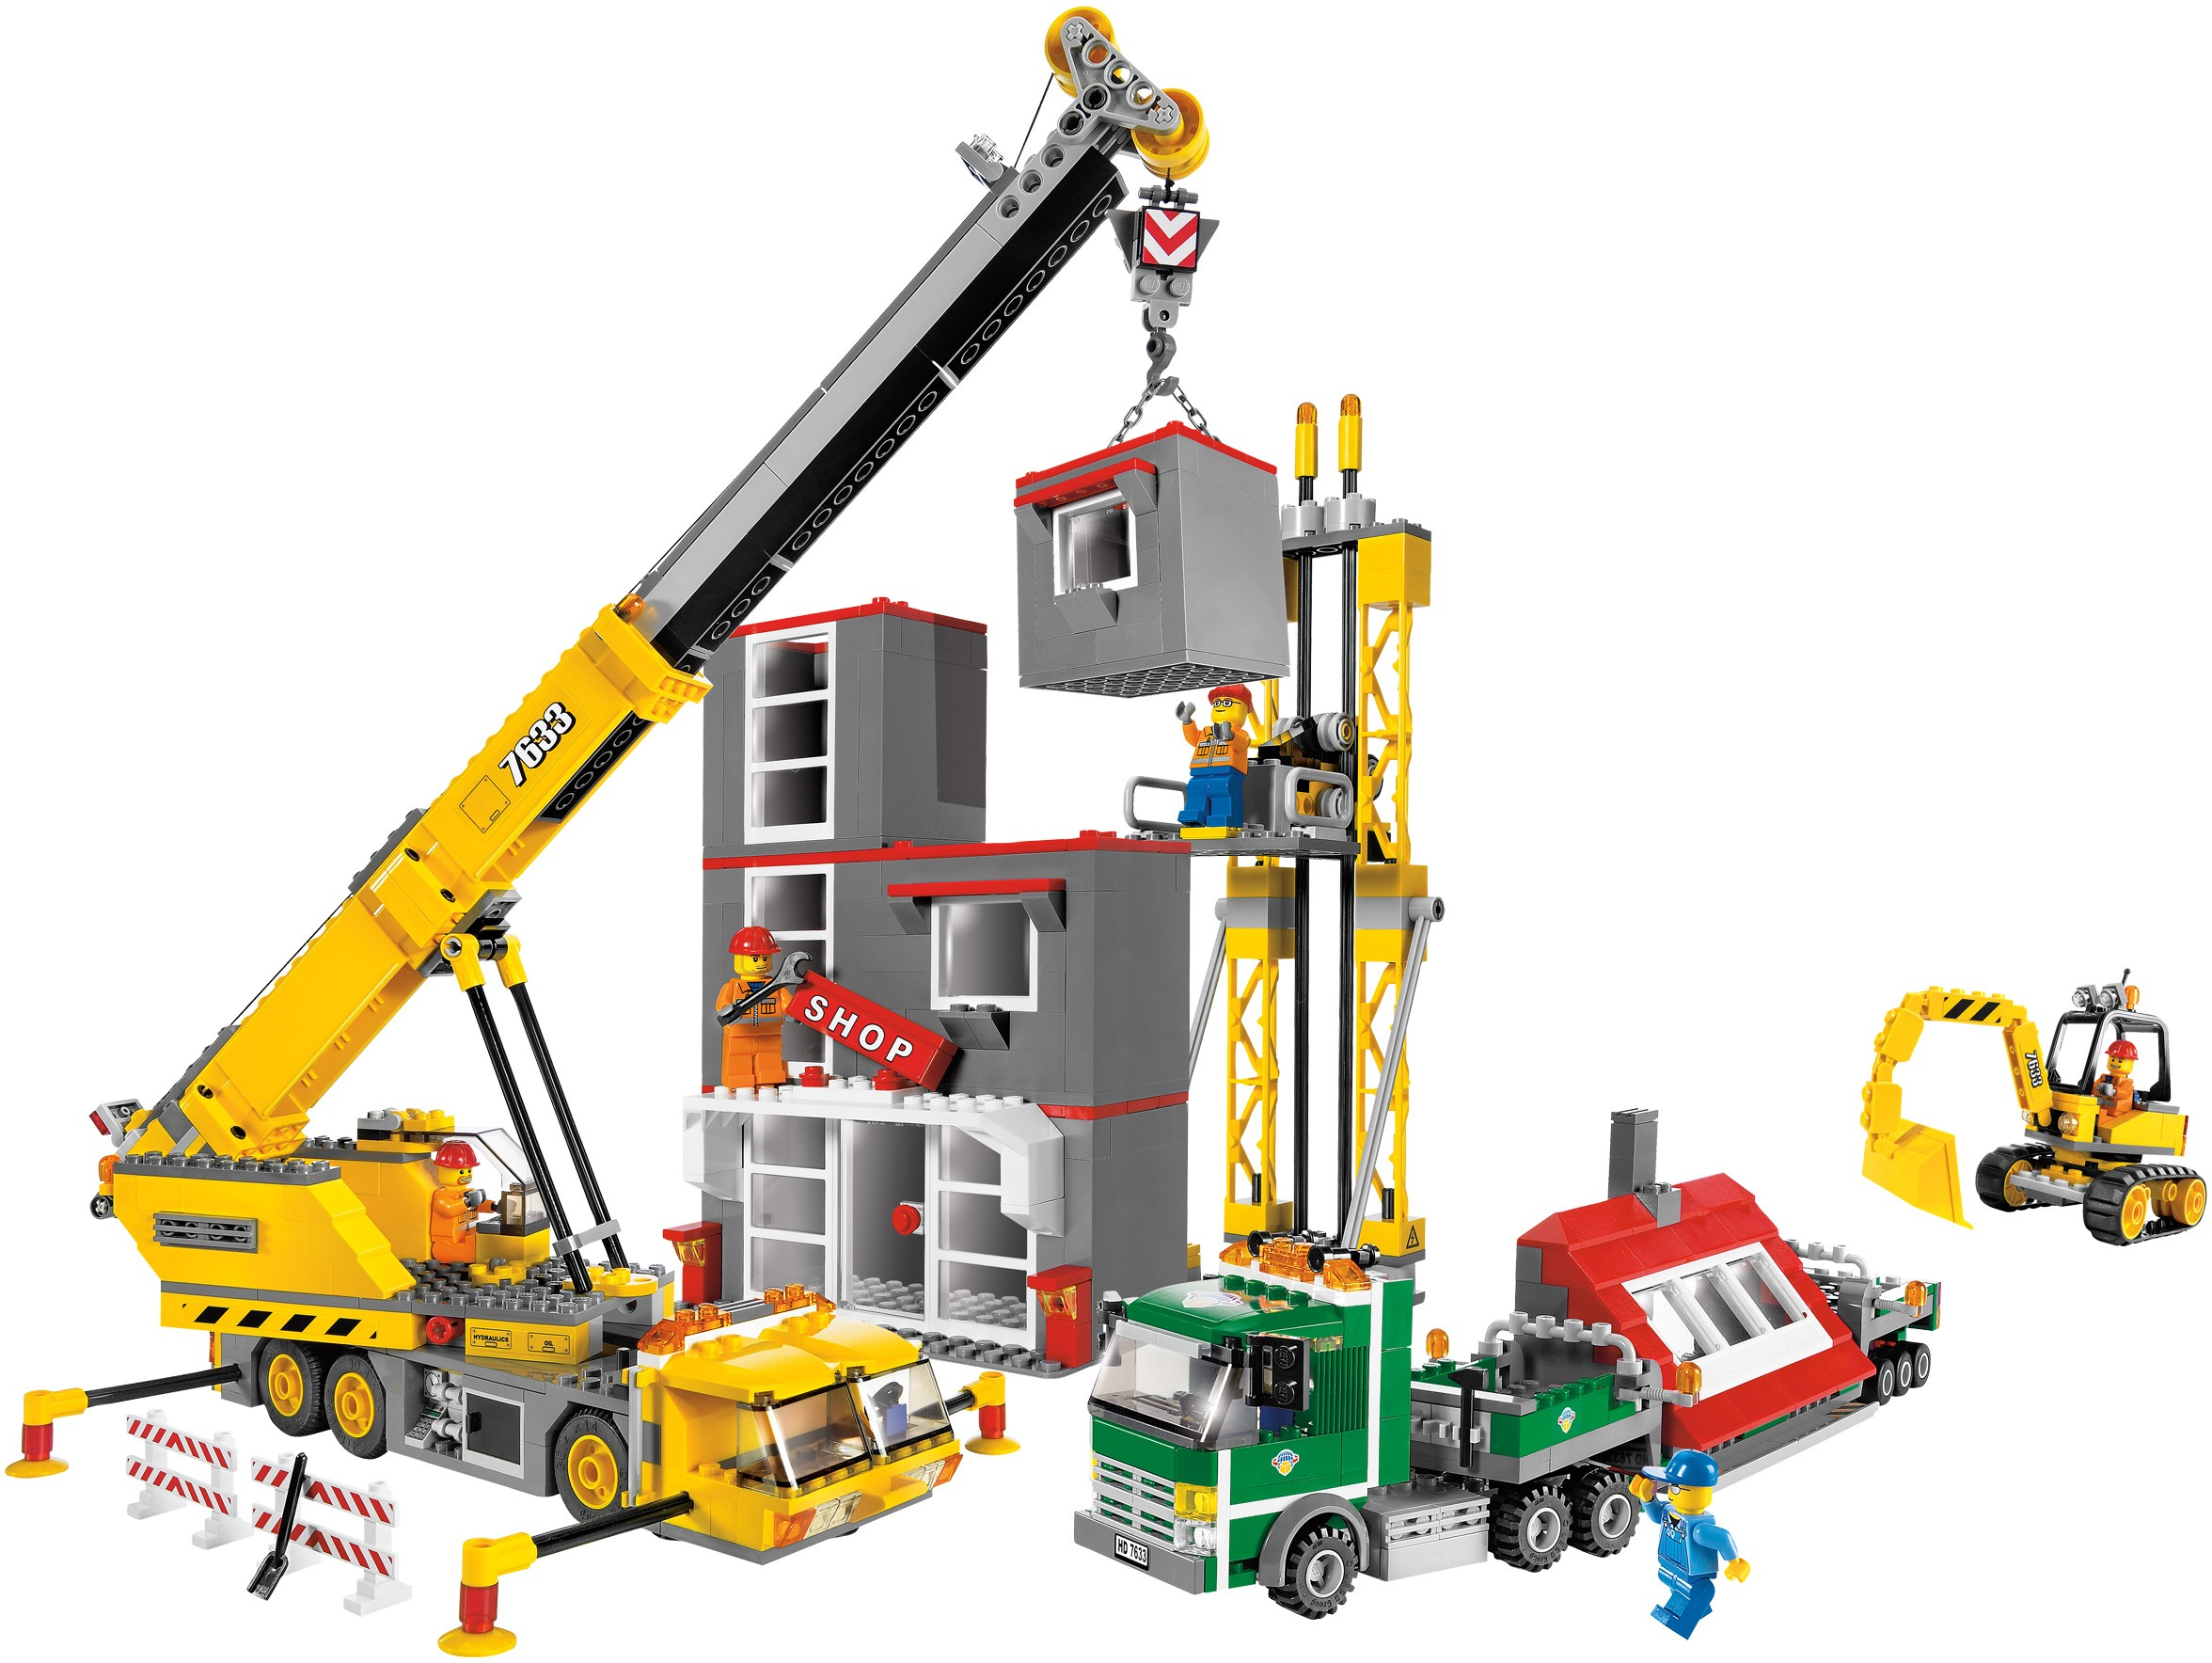 City construction brickset lego set guide and database - Notice de construction lego ...